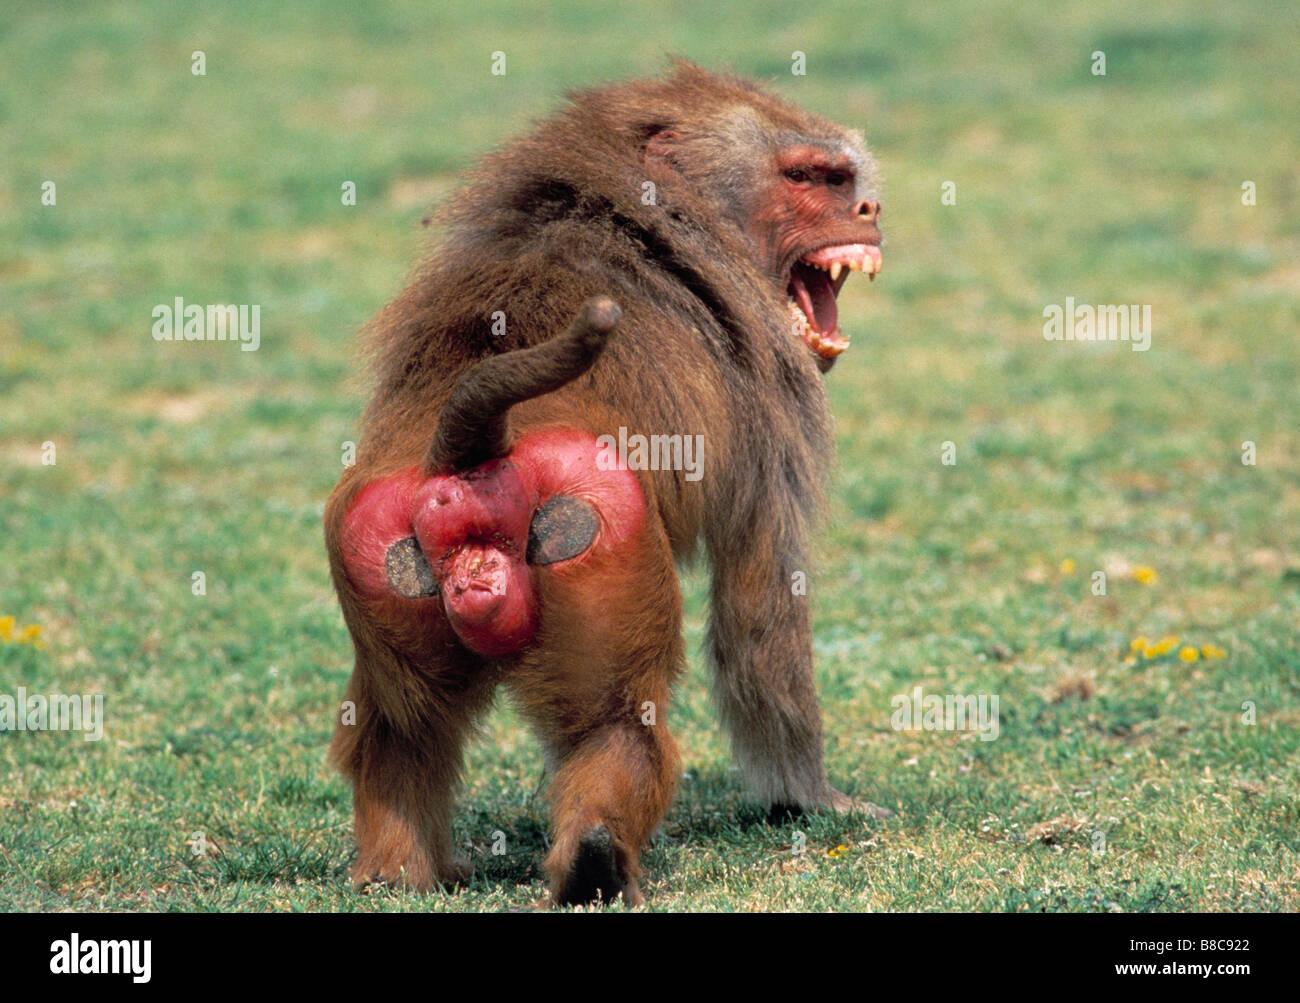 Hamadryas Baboon Butts